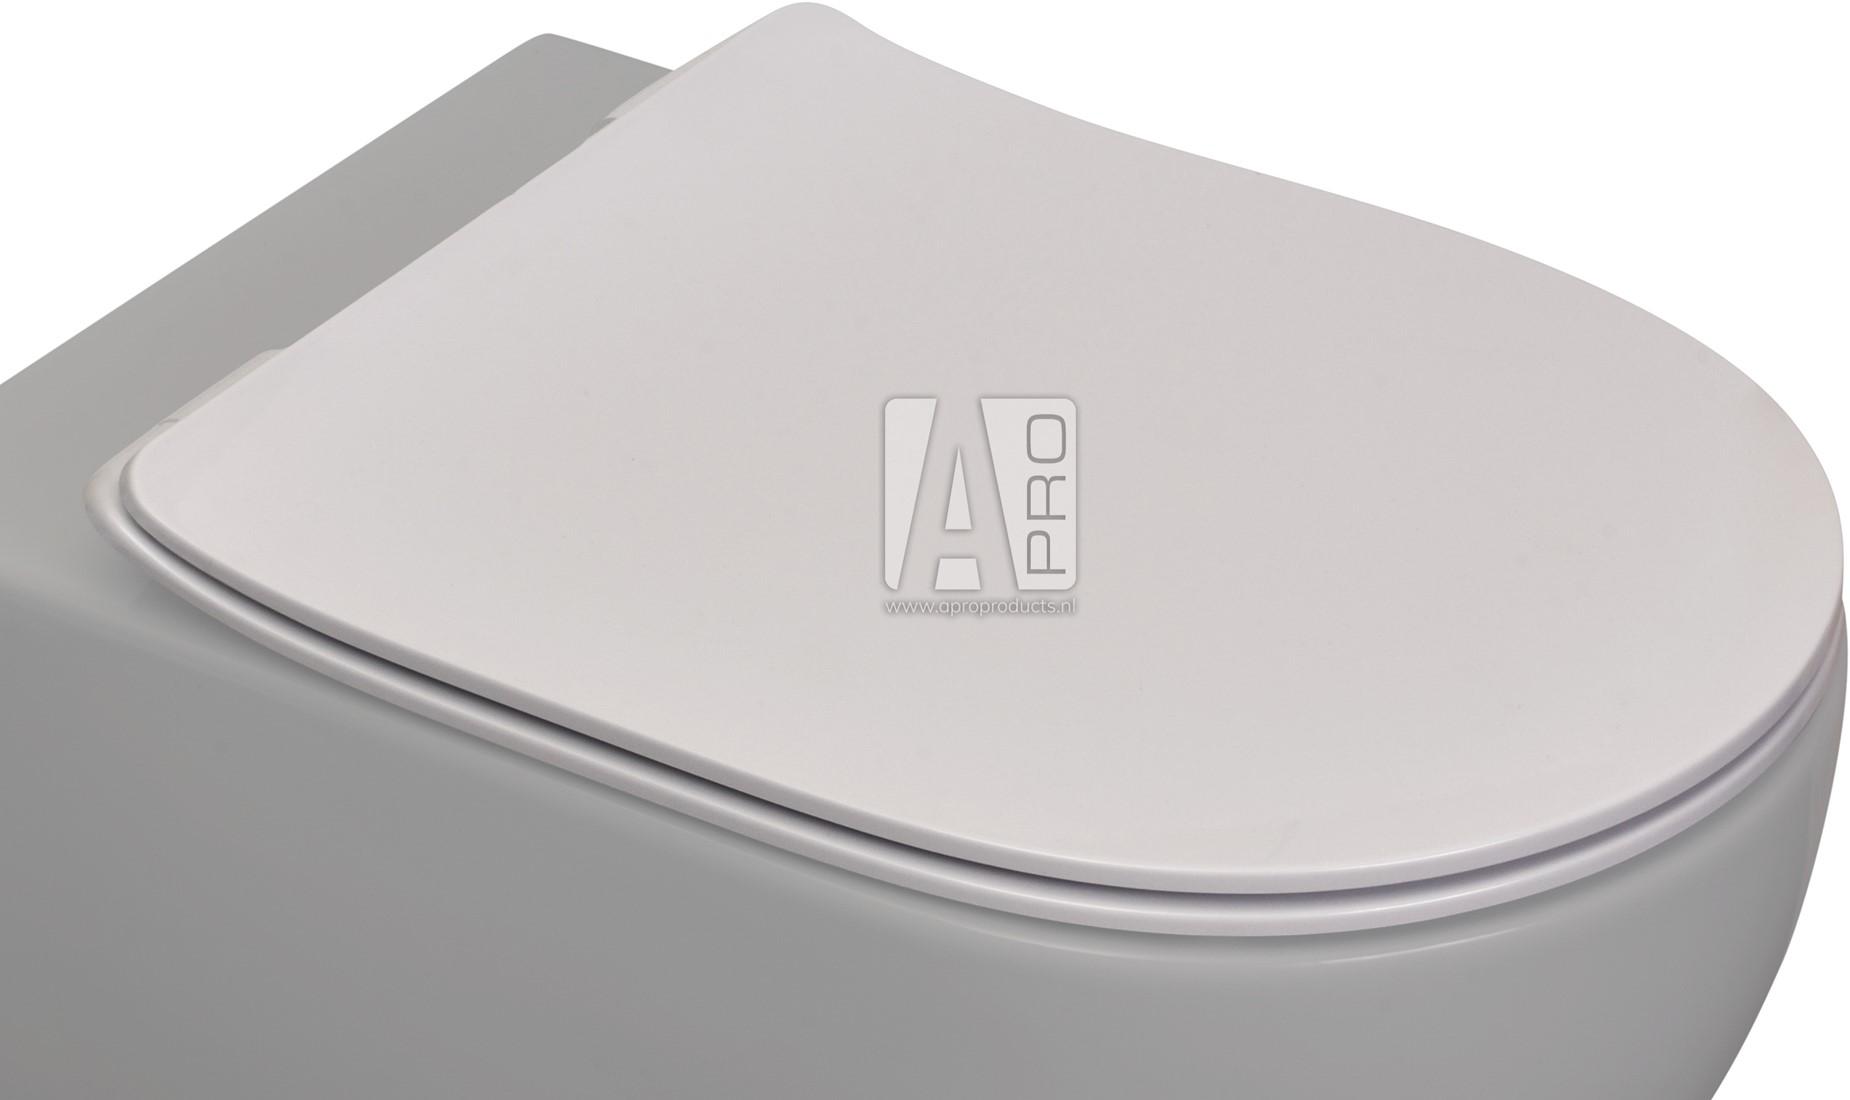 Top QKCW05 App toiletzitting met soft-close en quick release Apro OF86